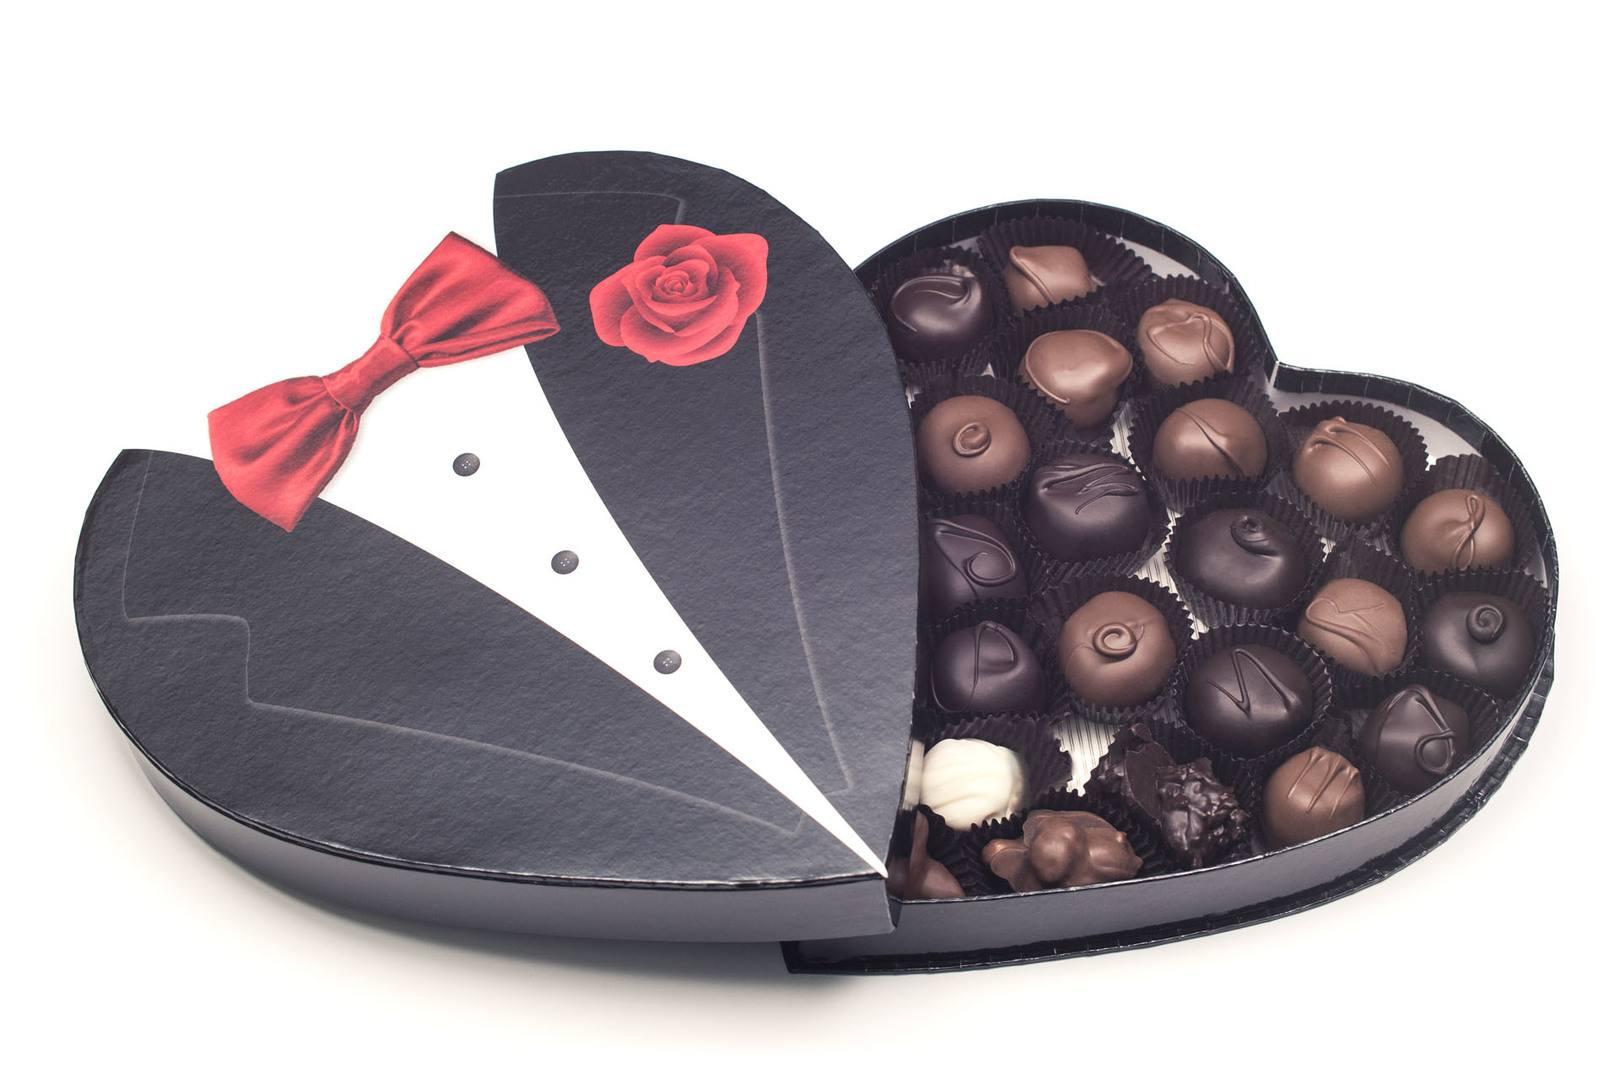 Ảnh Socola Valentine trái tim đẹp nhất